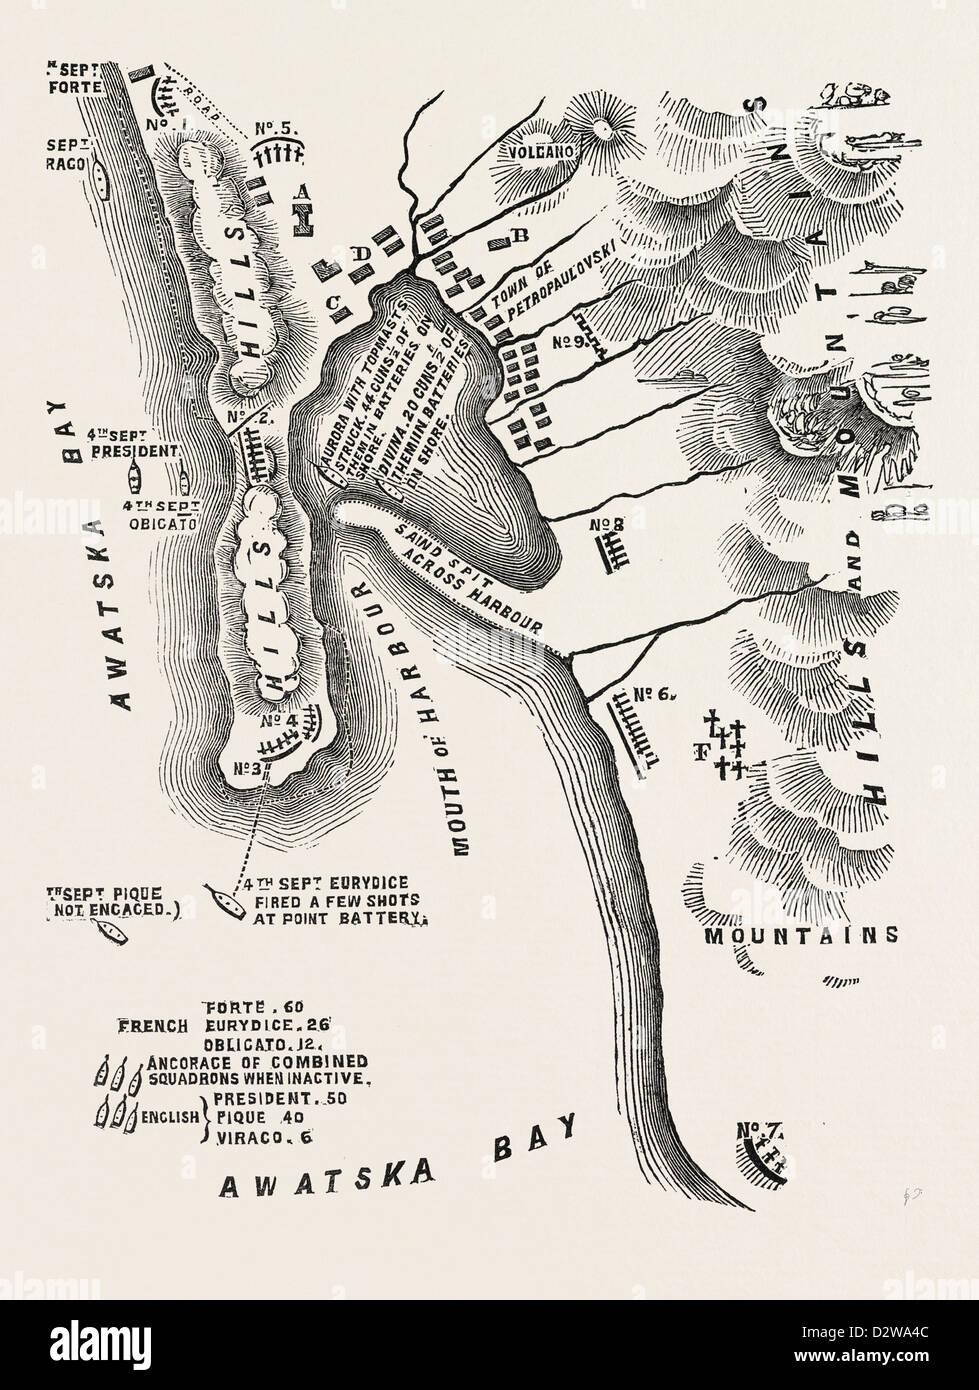 THE CRIMEAN WAR: PLAN OF PETROPAULOVSKI 1854 - Stock Image